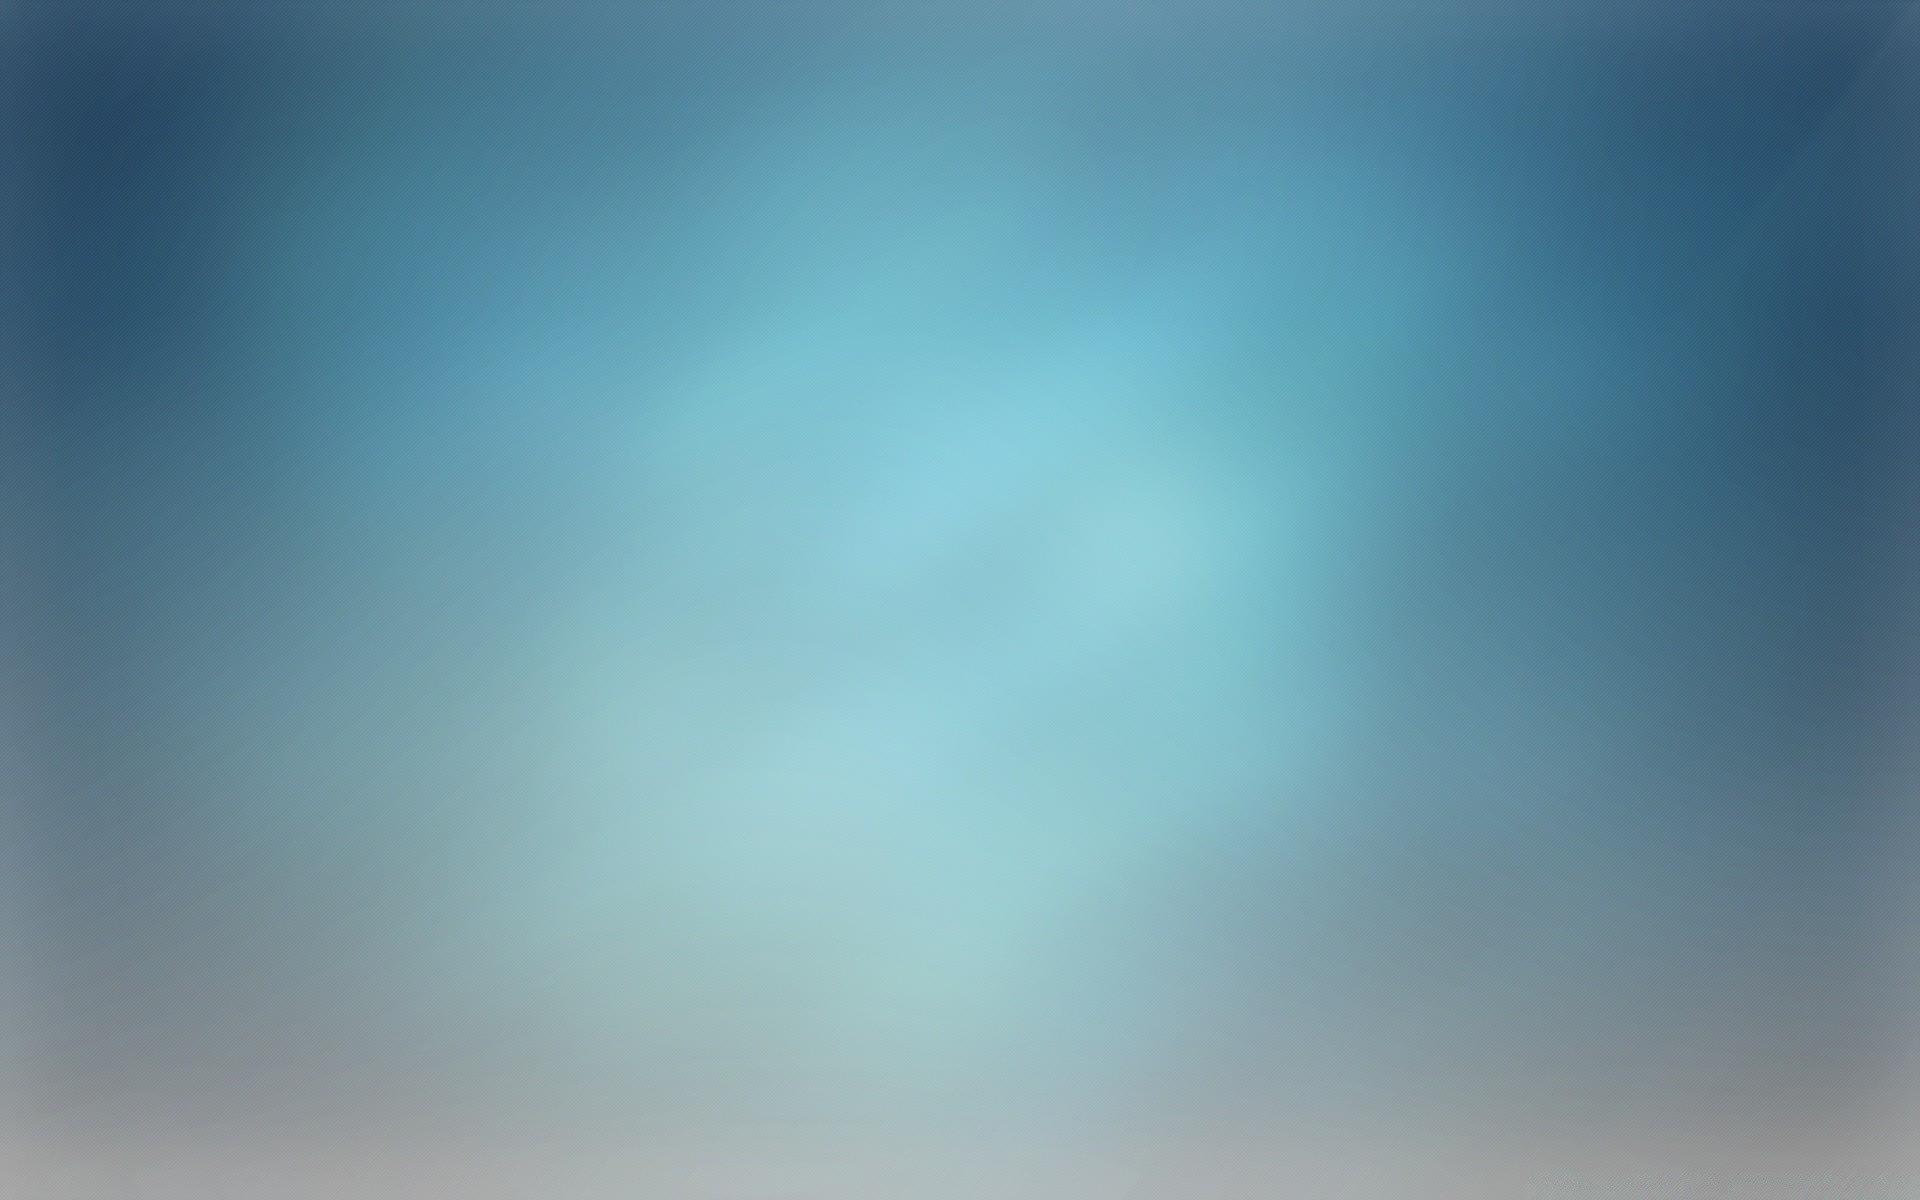 Bright Colors Abstract Sky Light Color Blur Desktop Art Nature Background Shining Wallpaper Space Sun